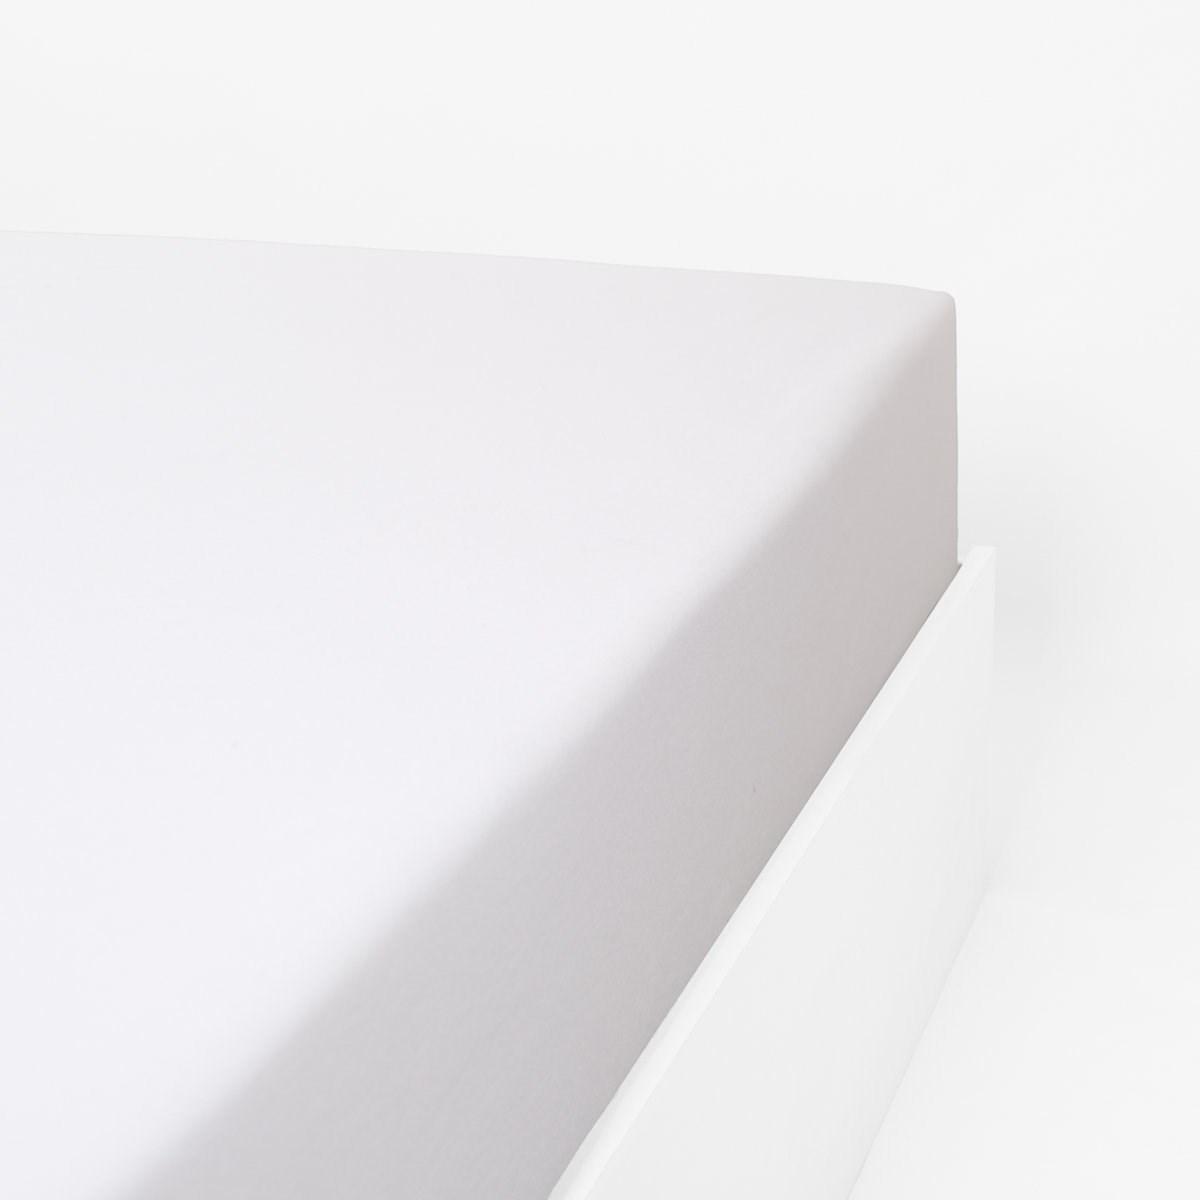 Drap housse flanelle en Molleton Blanc 90x200 cm